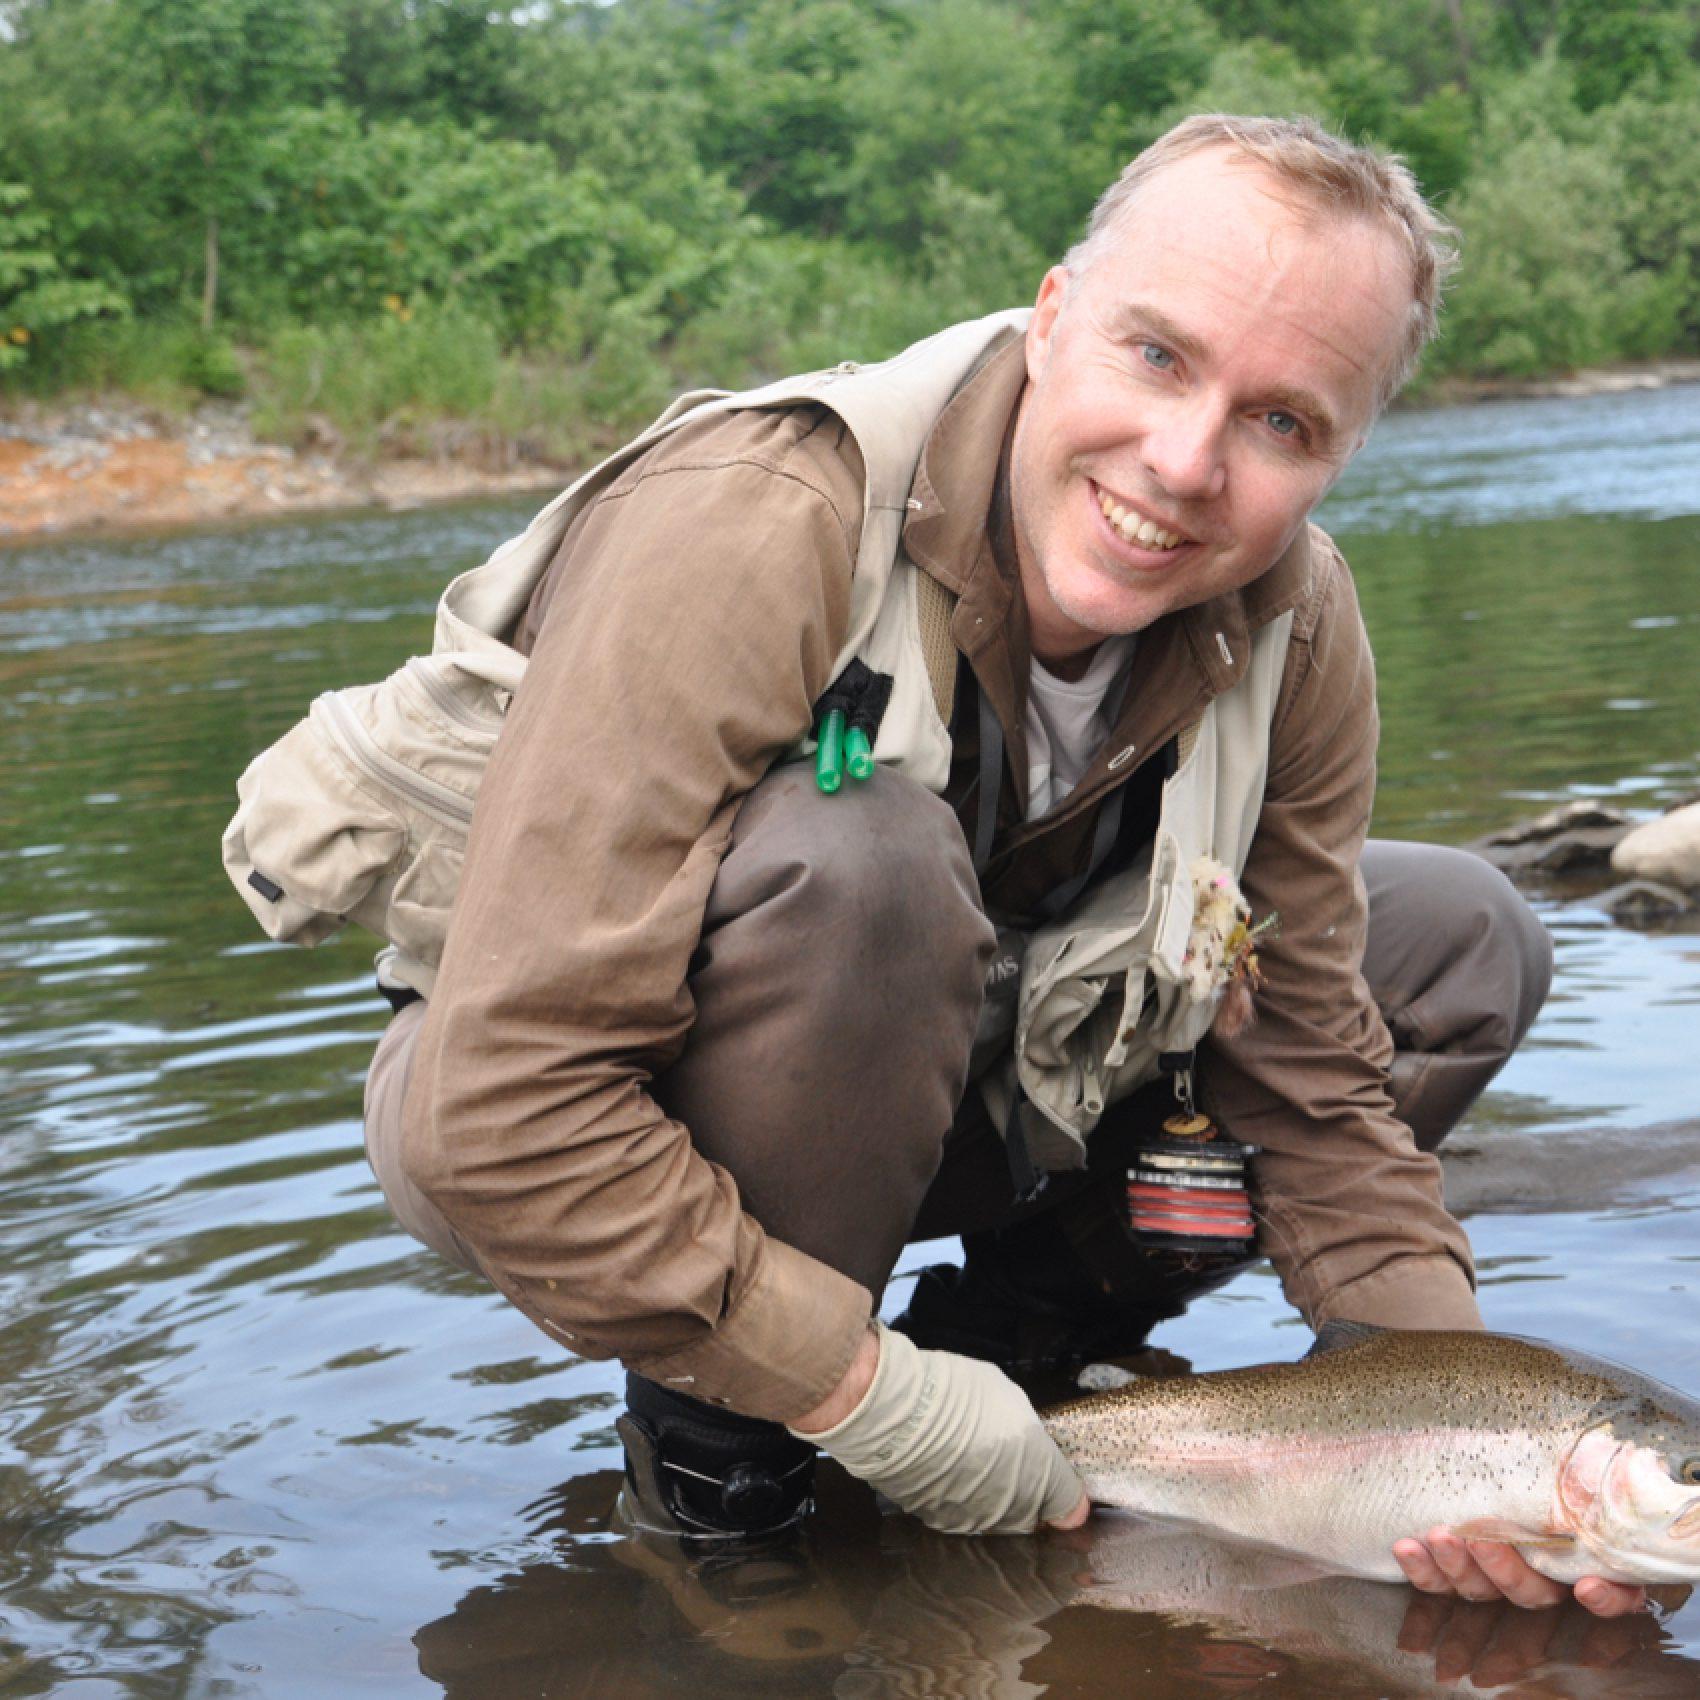 Rick Wallace with a fat rainbown trout taken in Hokkaido's Teshio River. Credit: Takahiko Chiba